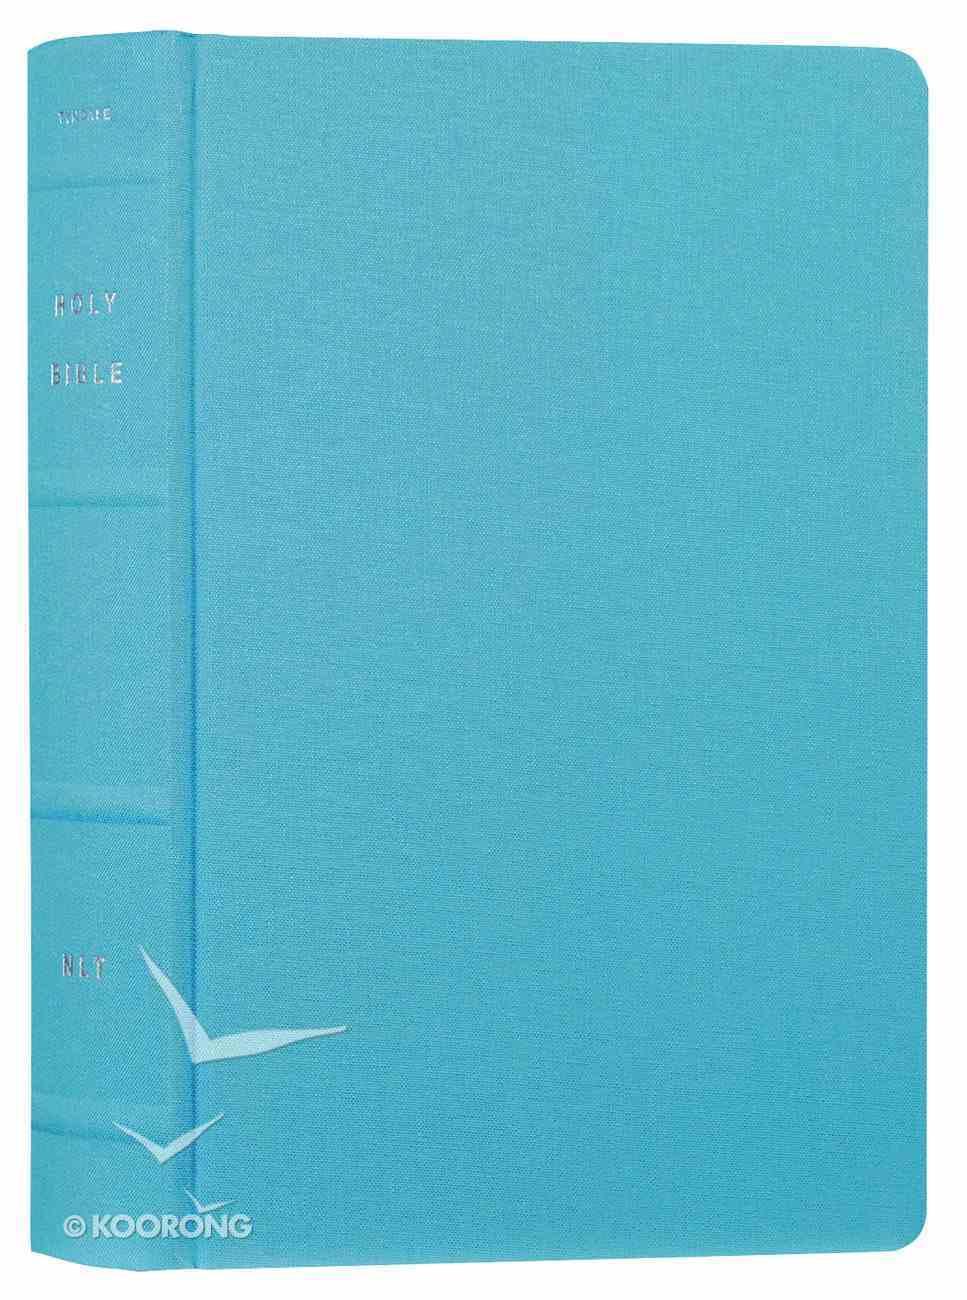 NLT Reflections Bible Ocean Blue (Black Letter Edition) Fabric Over Hardback